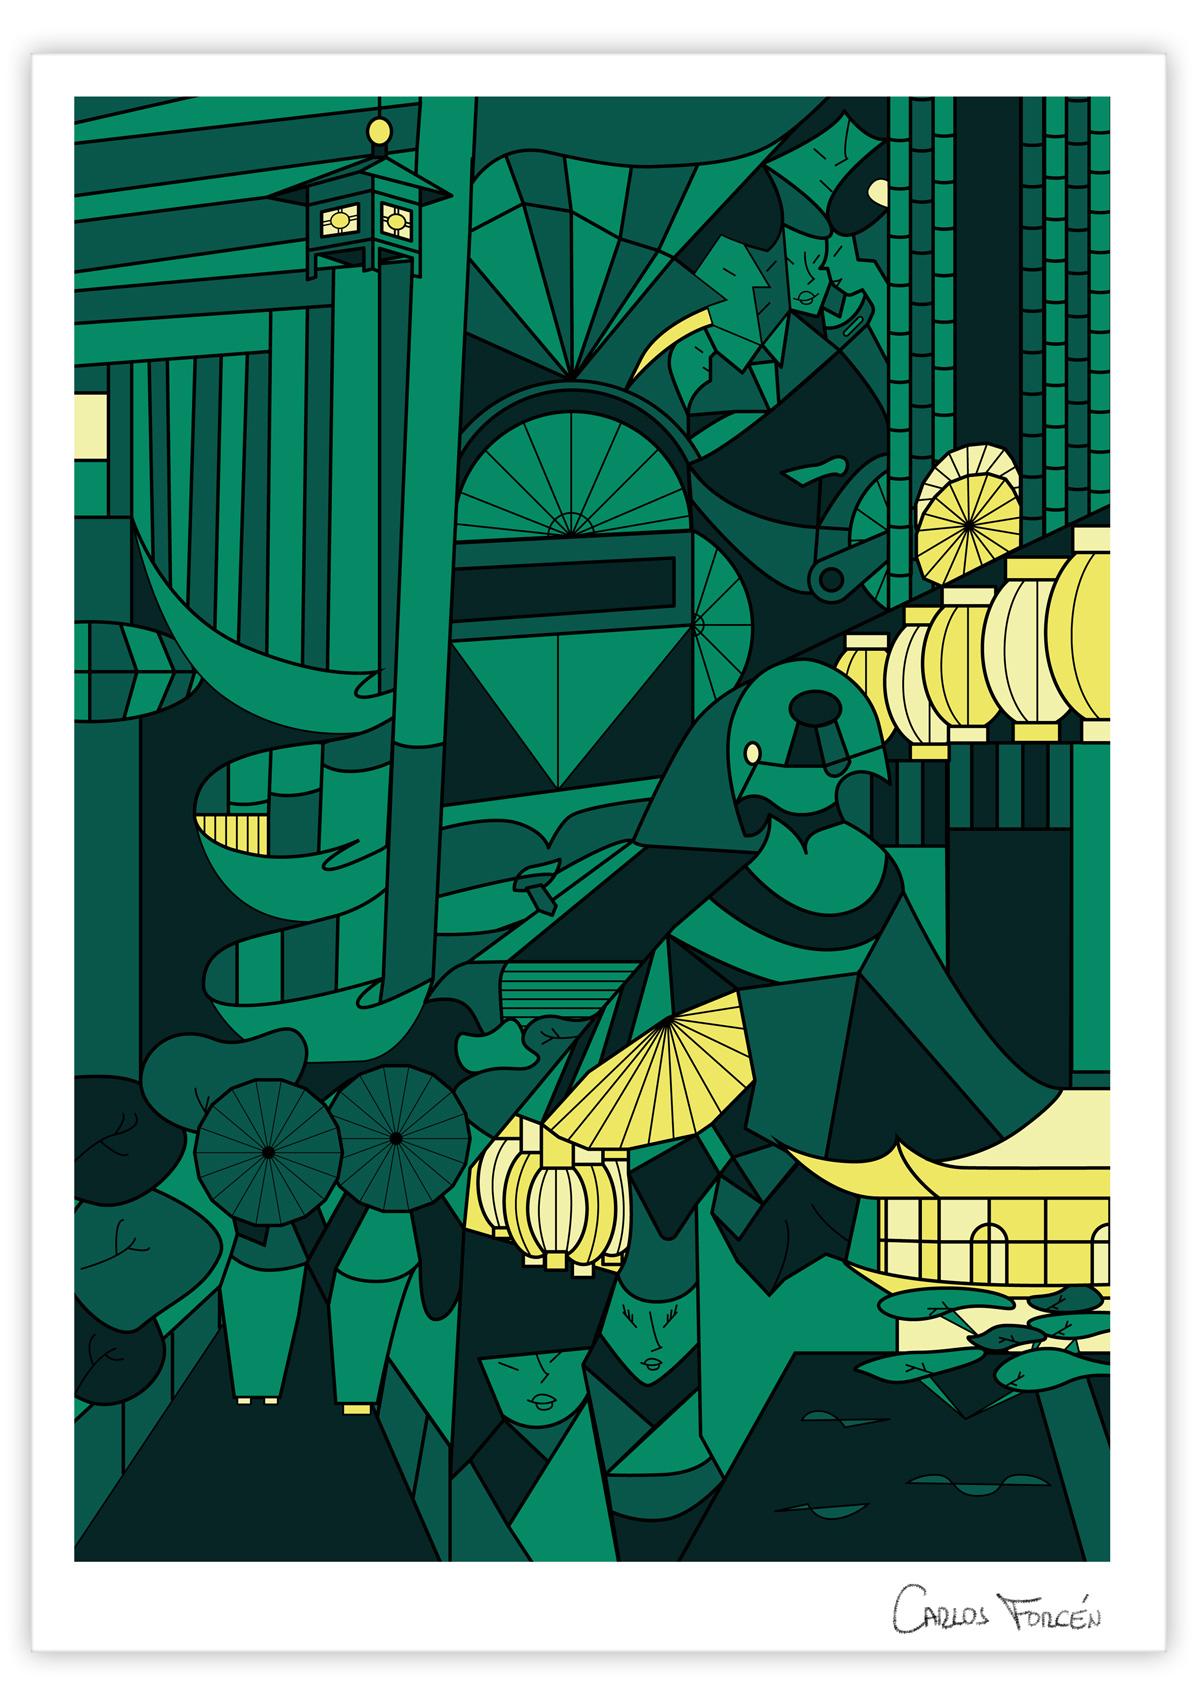 kioto-night_carlos-forcen_ilustracion_signed-01